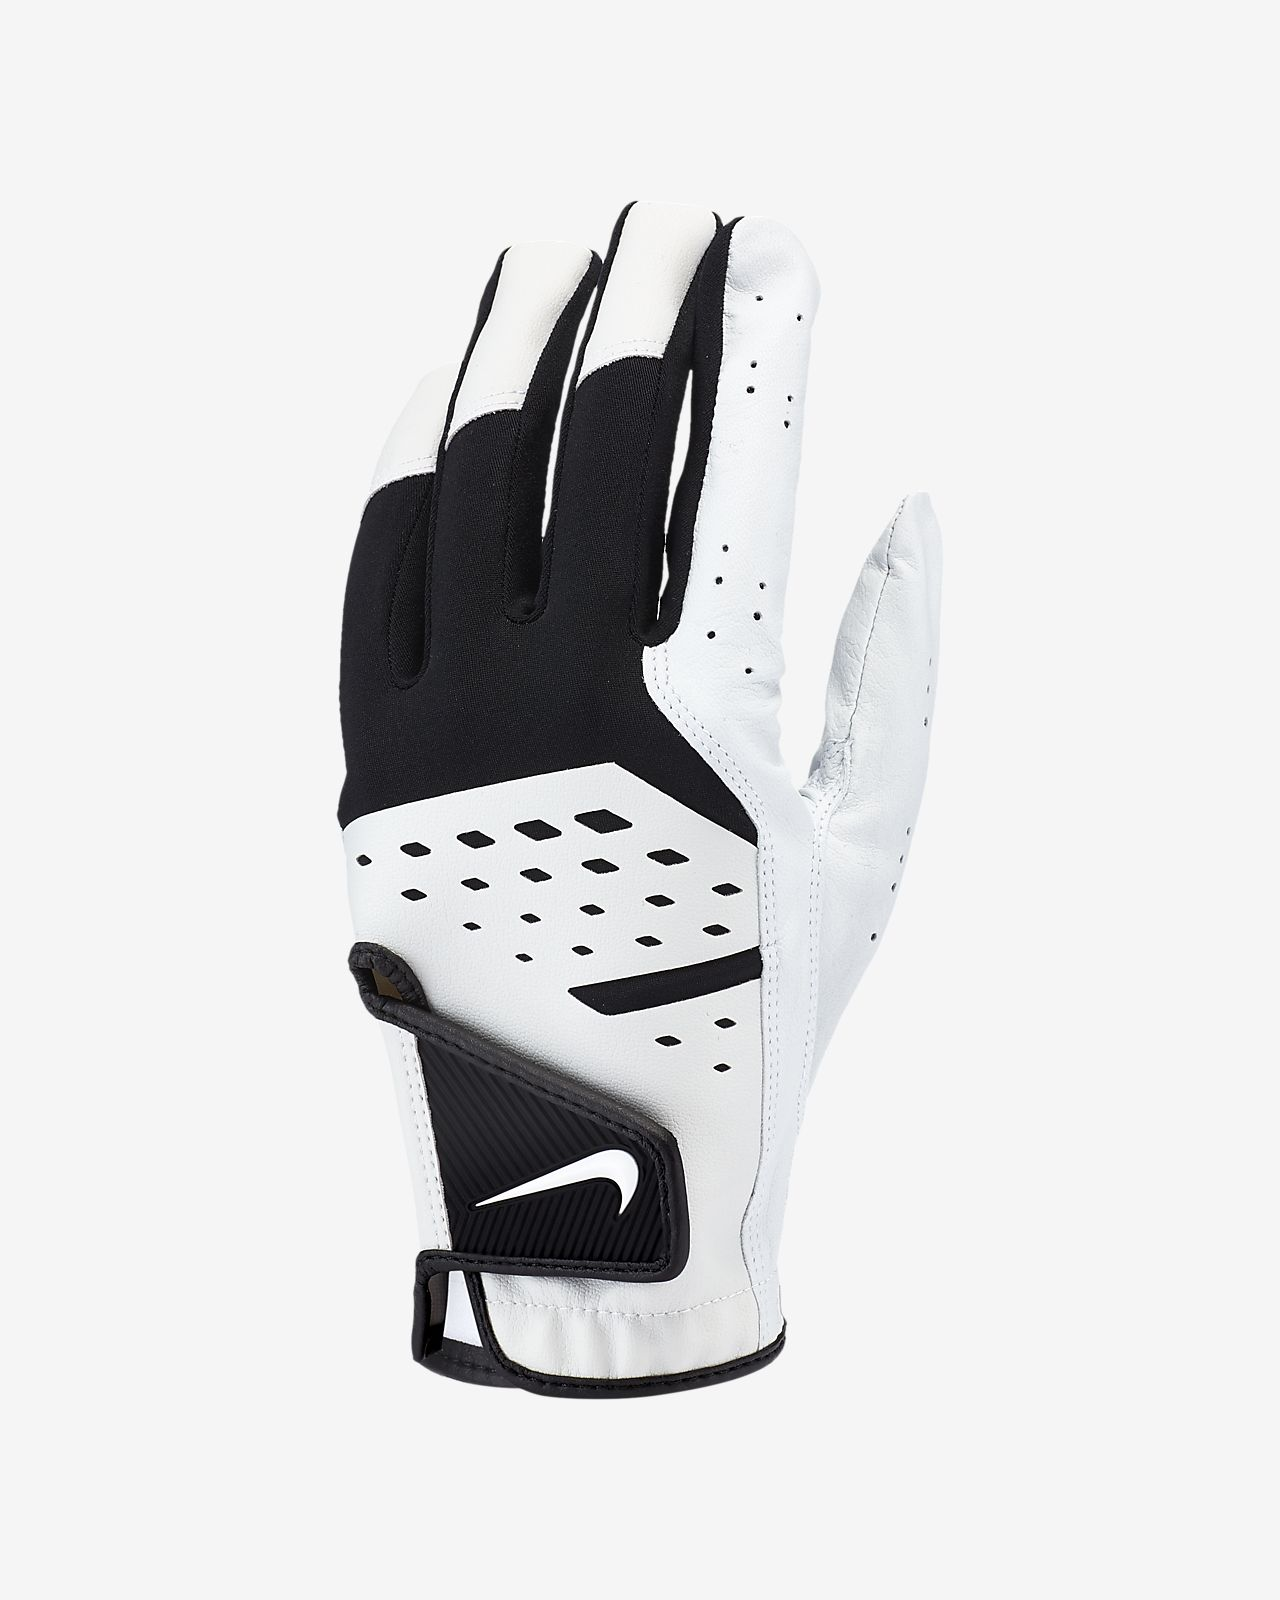 Nike Tech Extreme VII Golf Glove (Right Regular)